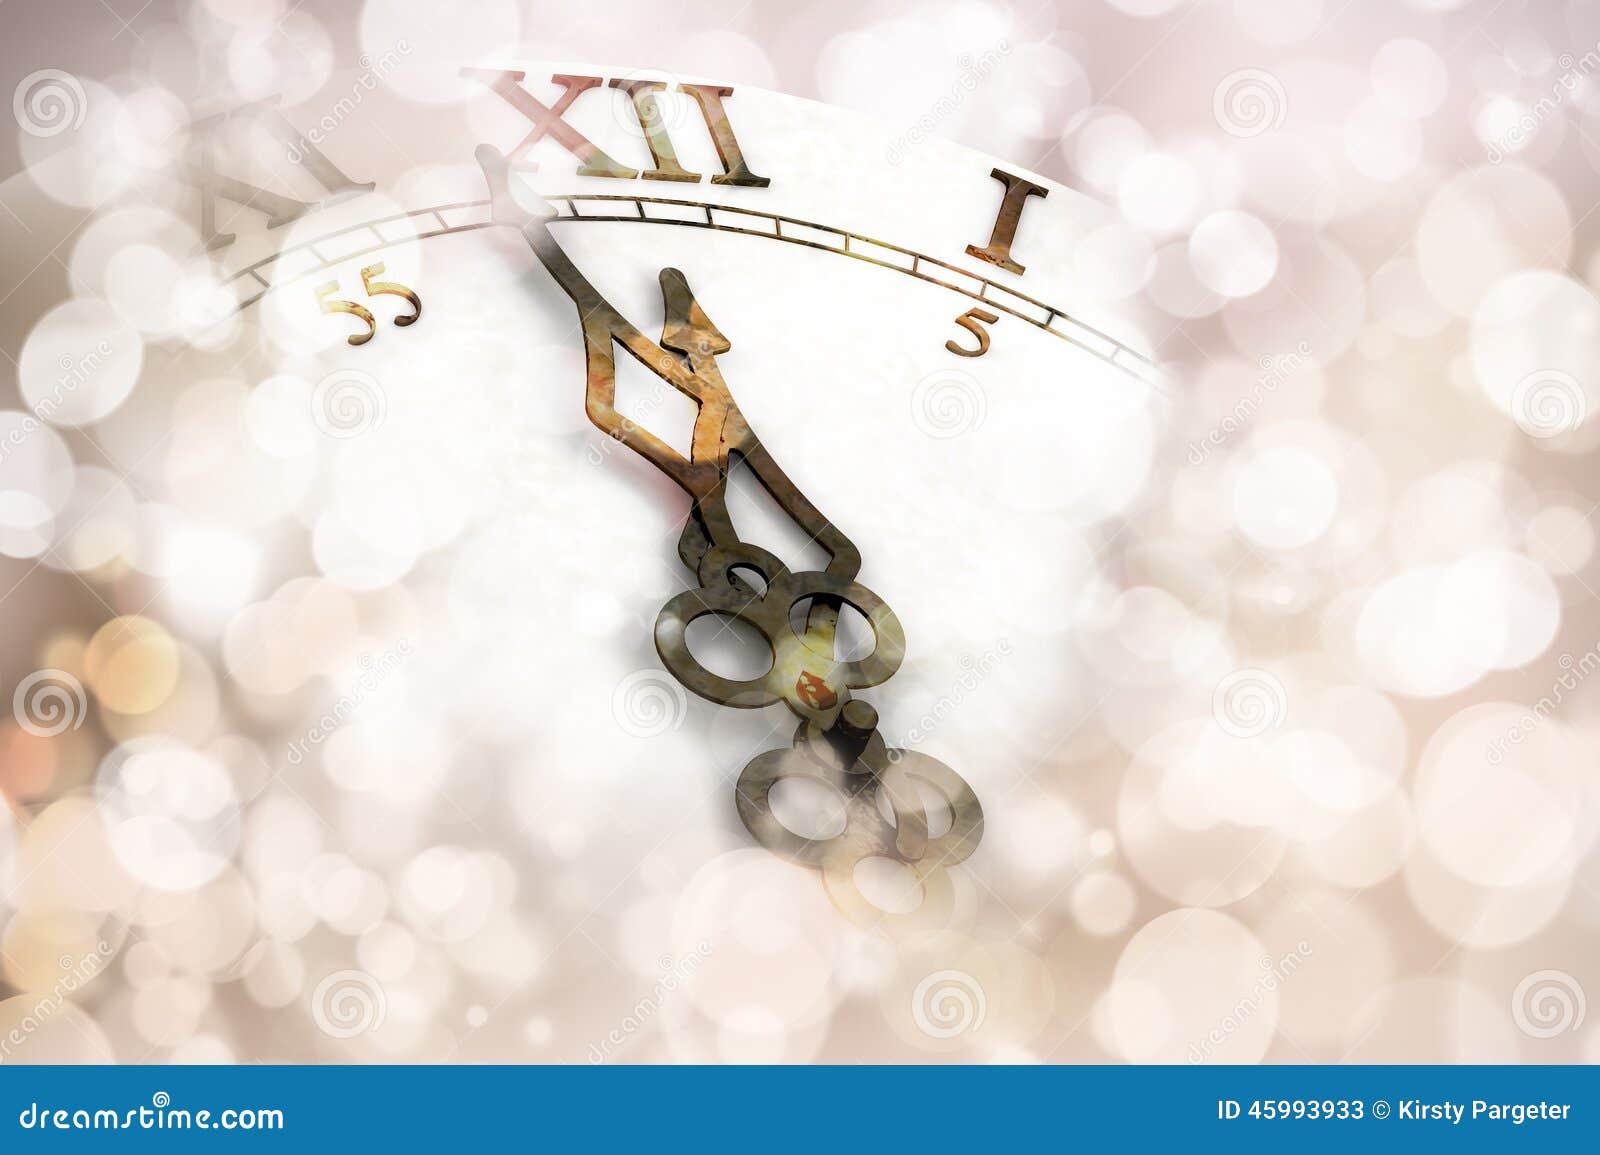 New Year clock background stock illustration. Illustration of clock ...